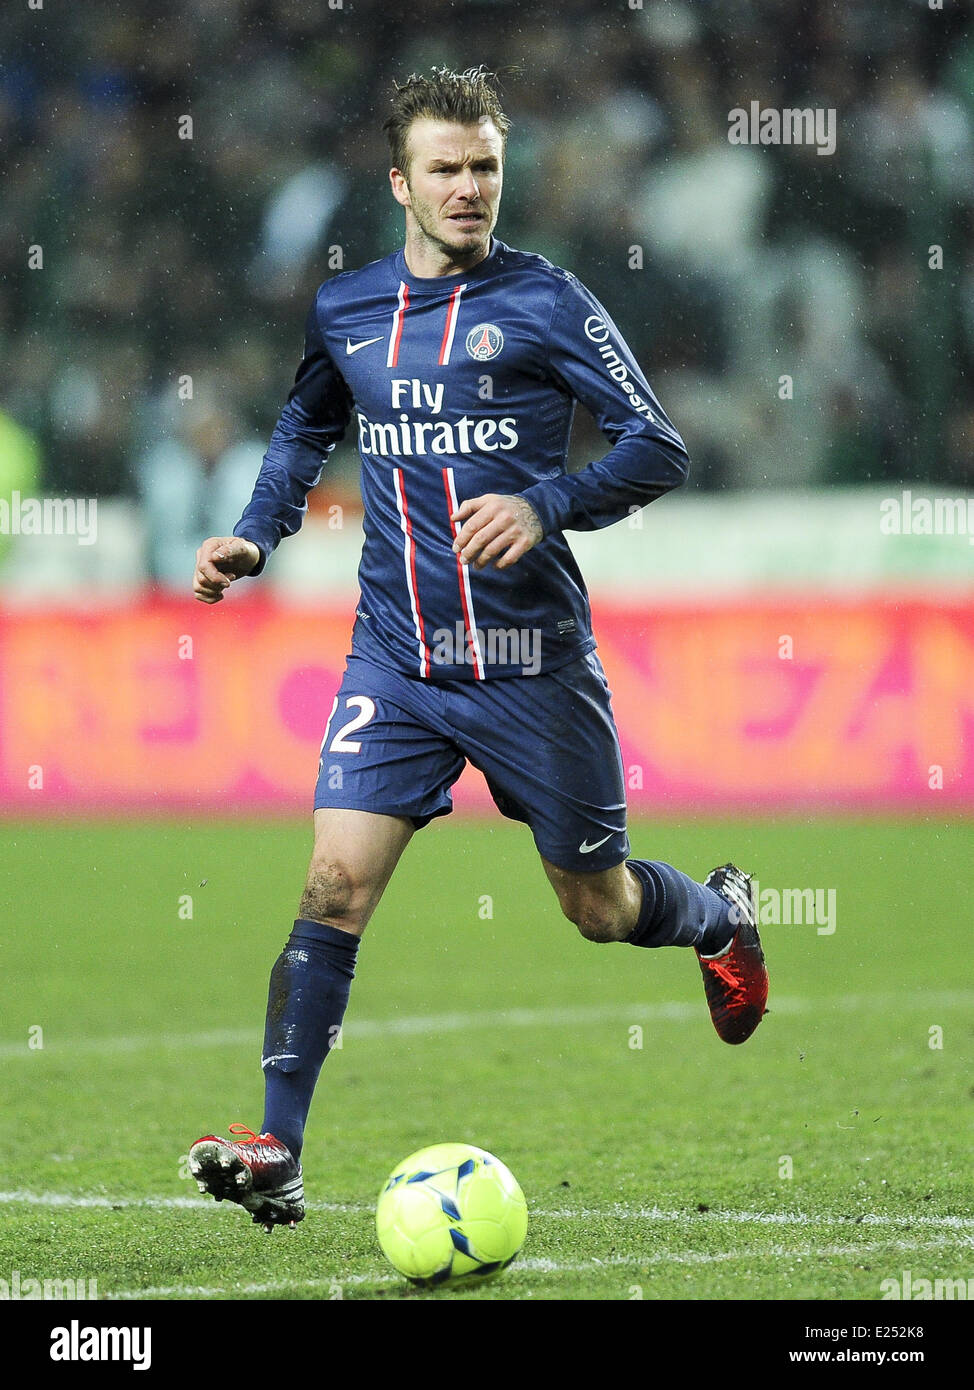 c89a05700 Paris Saint-Germain (PSG) vs. Saint-Etienne at Stade Geoffroy-Guichard  Featuring: David Beckham Where: St Etienne, France When: 17 Mar 2013